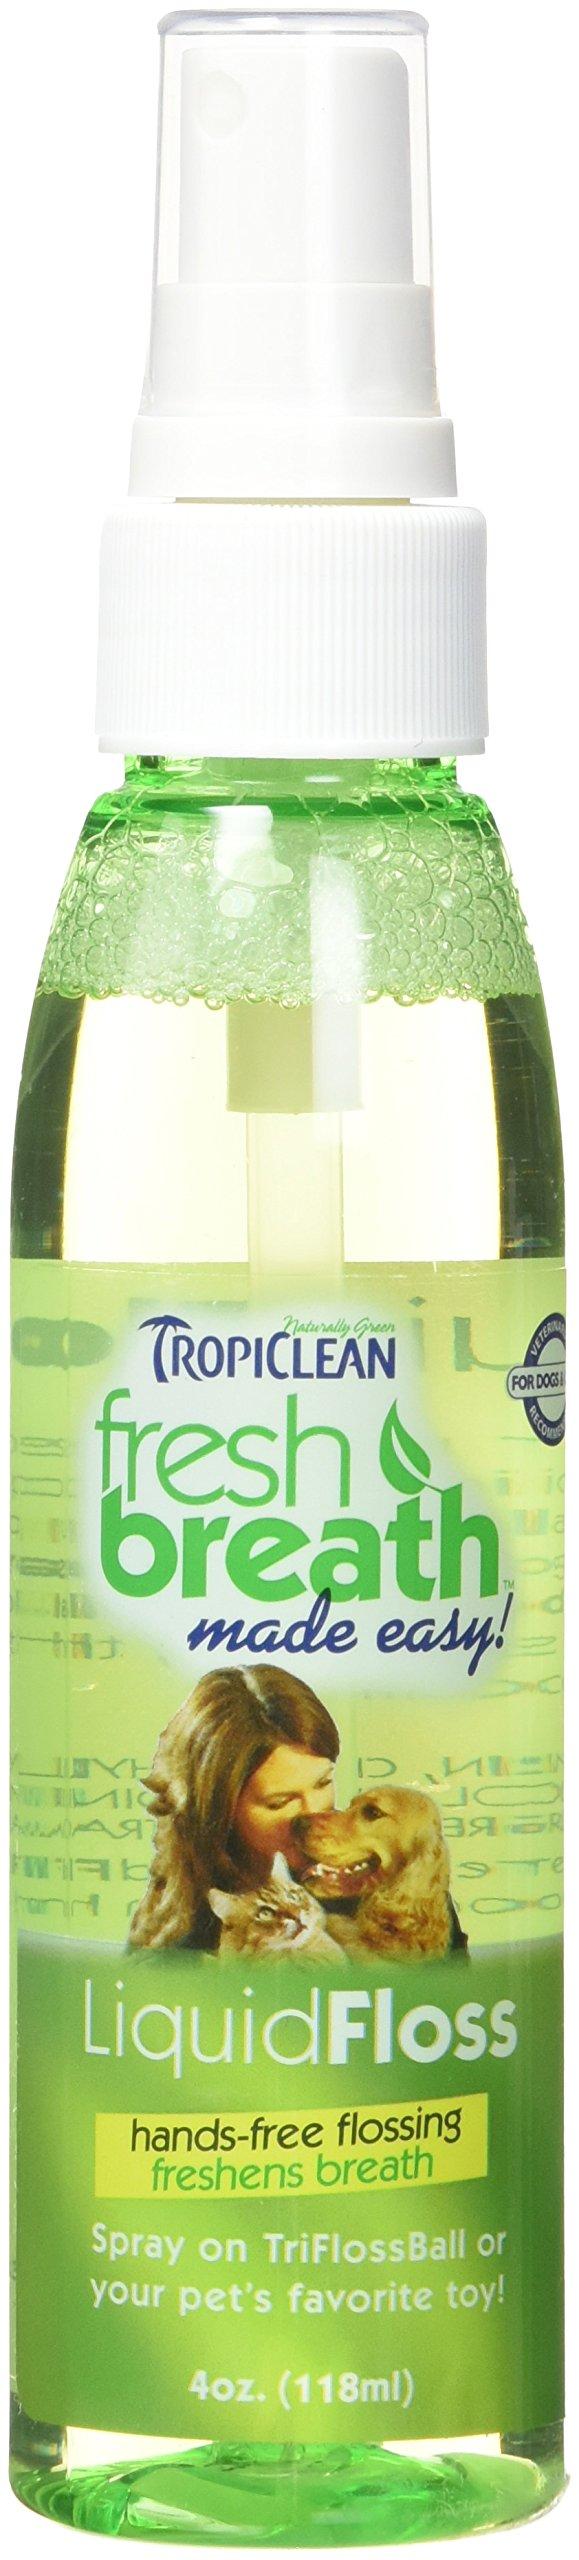 Tropiclean Fresh Breath Plaque Remover Pet Liquid Floss Spray 4oz